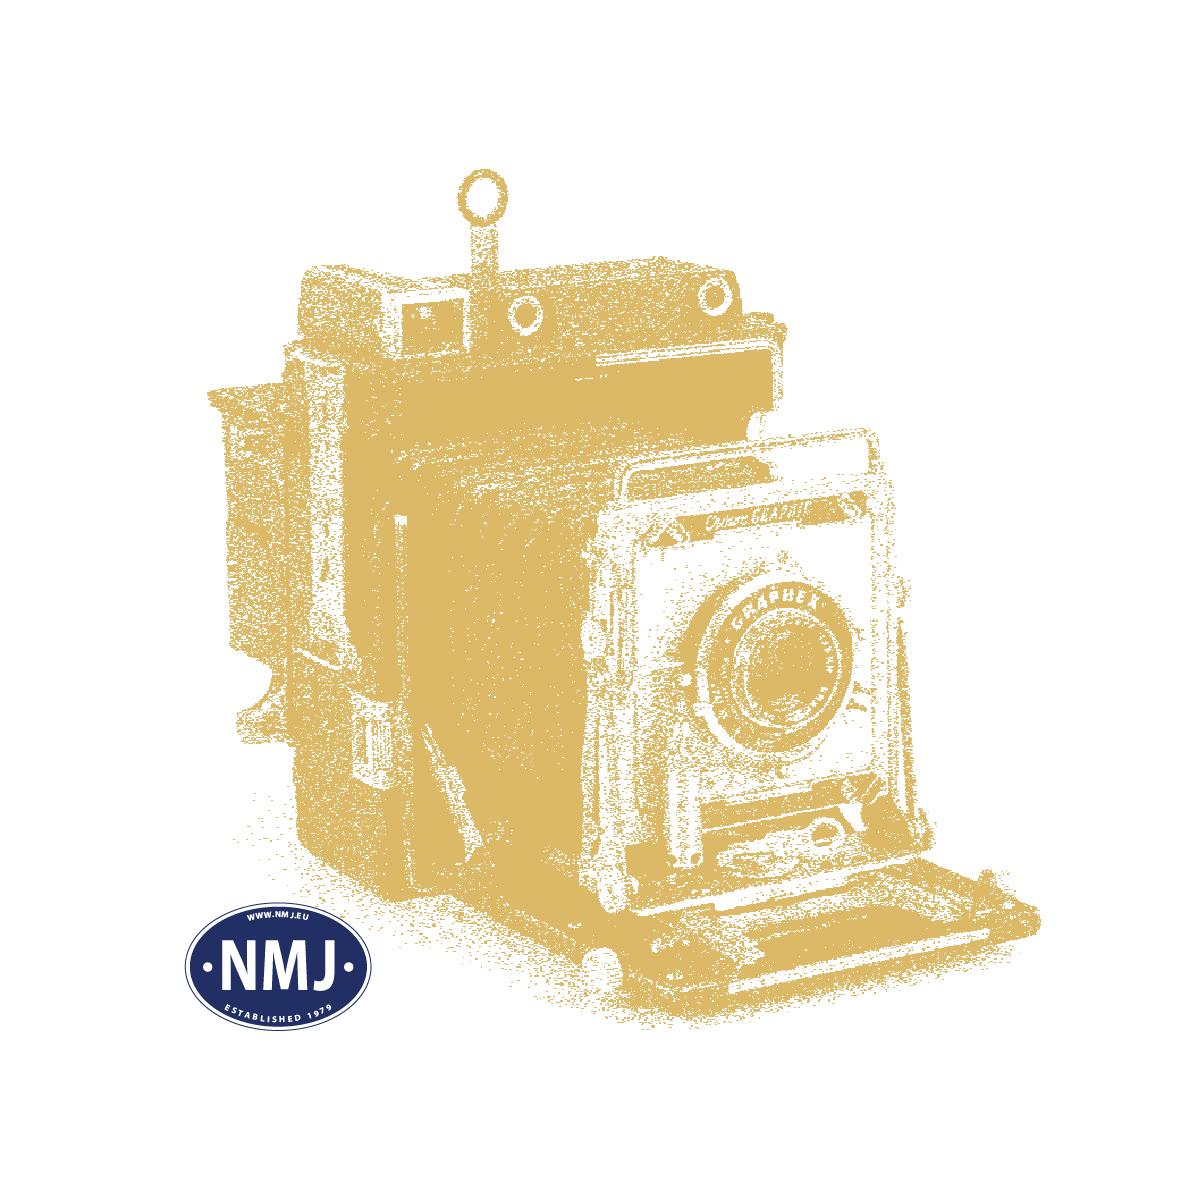 FIF400 - Flex-I-File Refill Tape - Fine 400 Grit